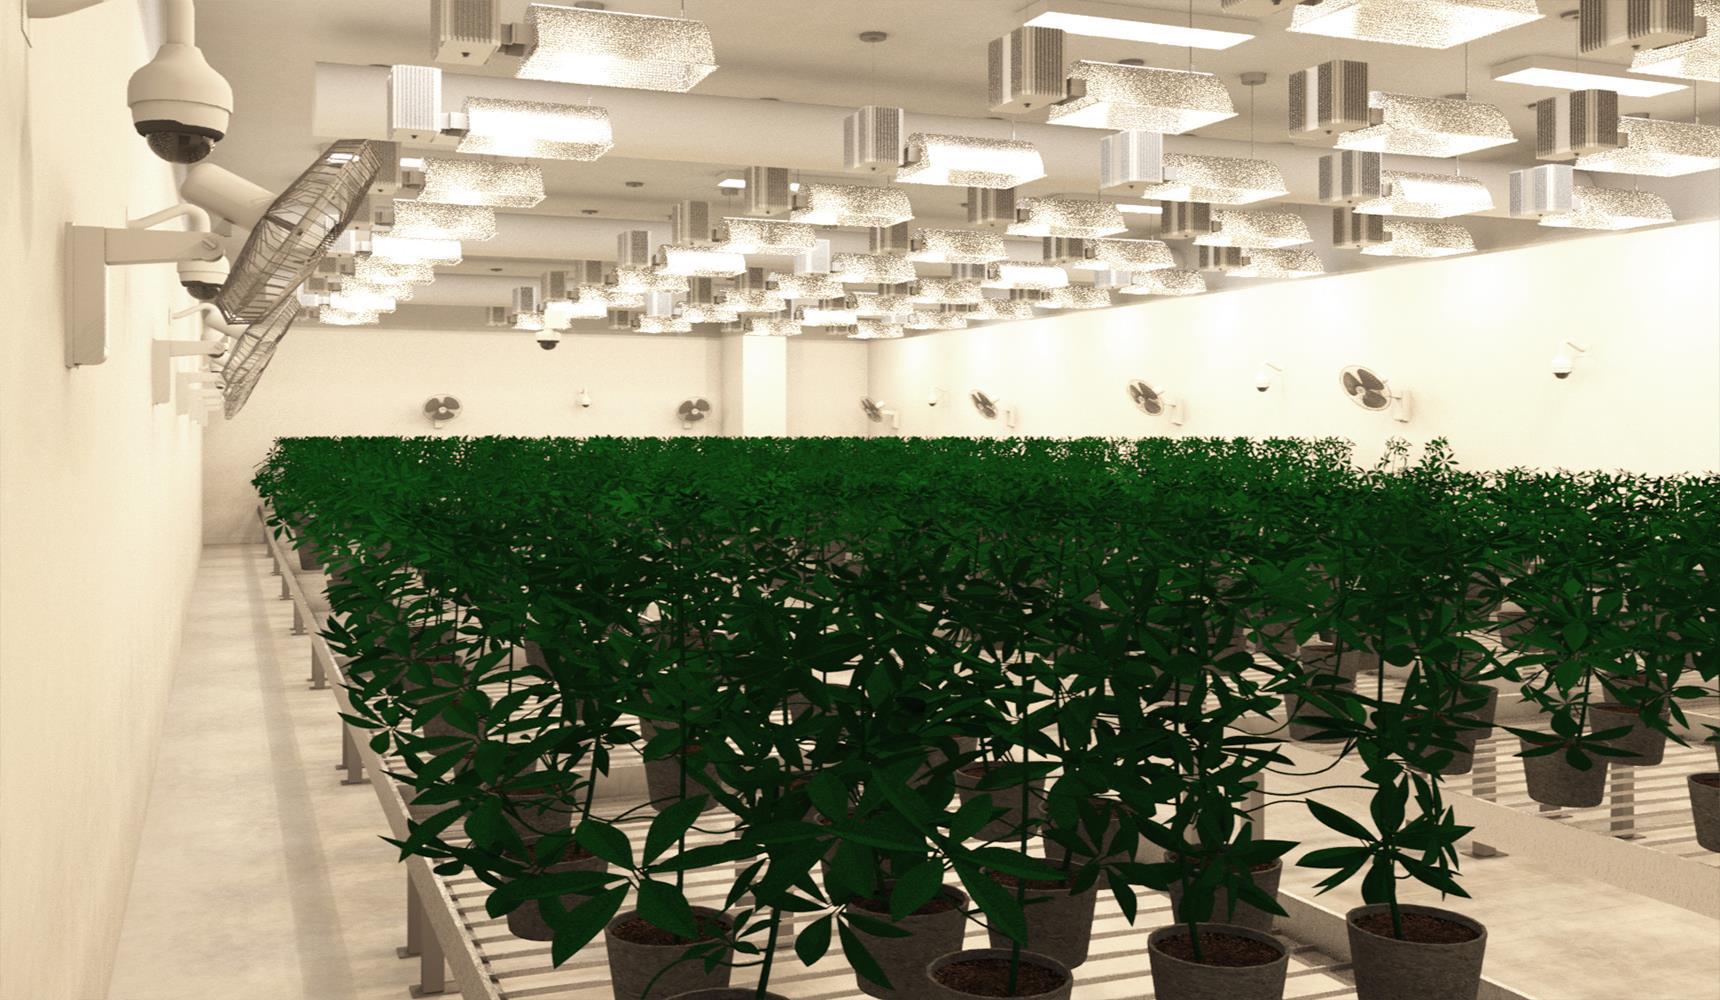 Grow Room Facility Design